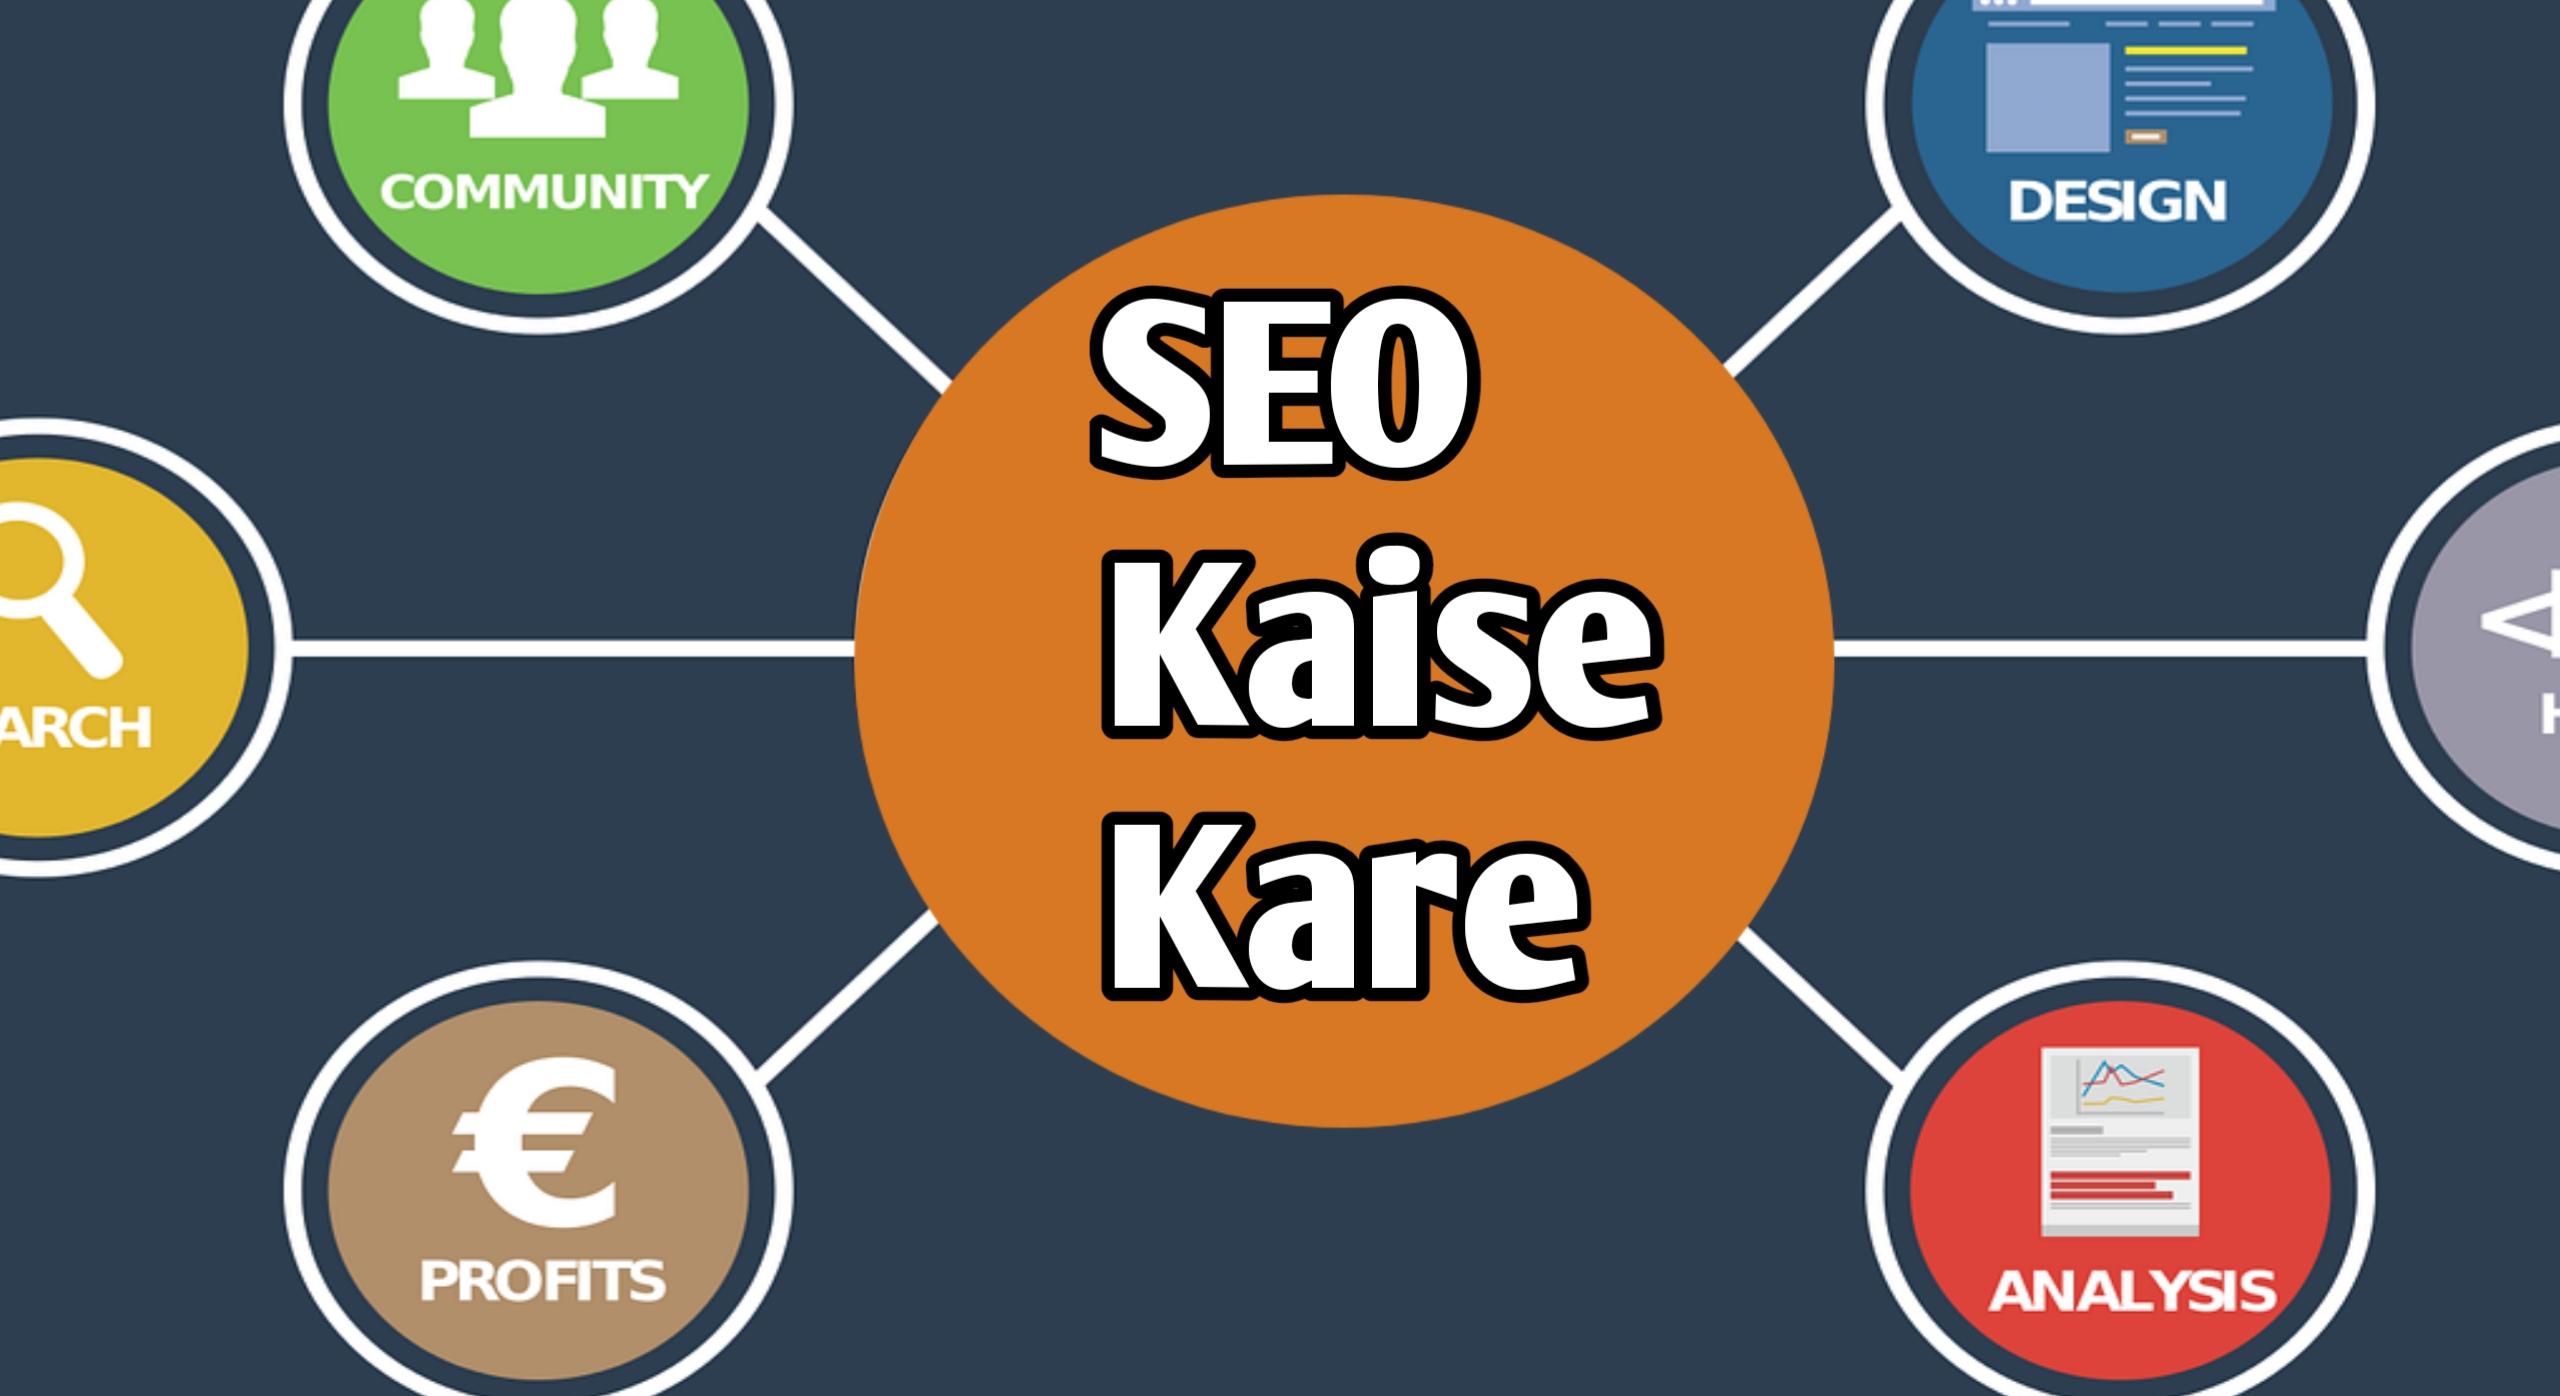 SEO Kaise Kare - On Page और Off Page SEO करने का तरीका